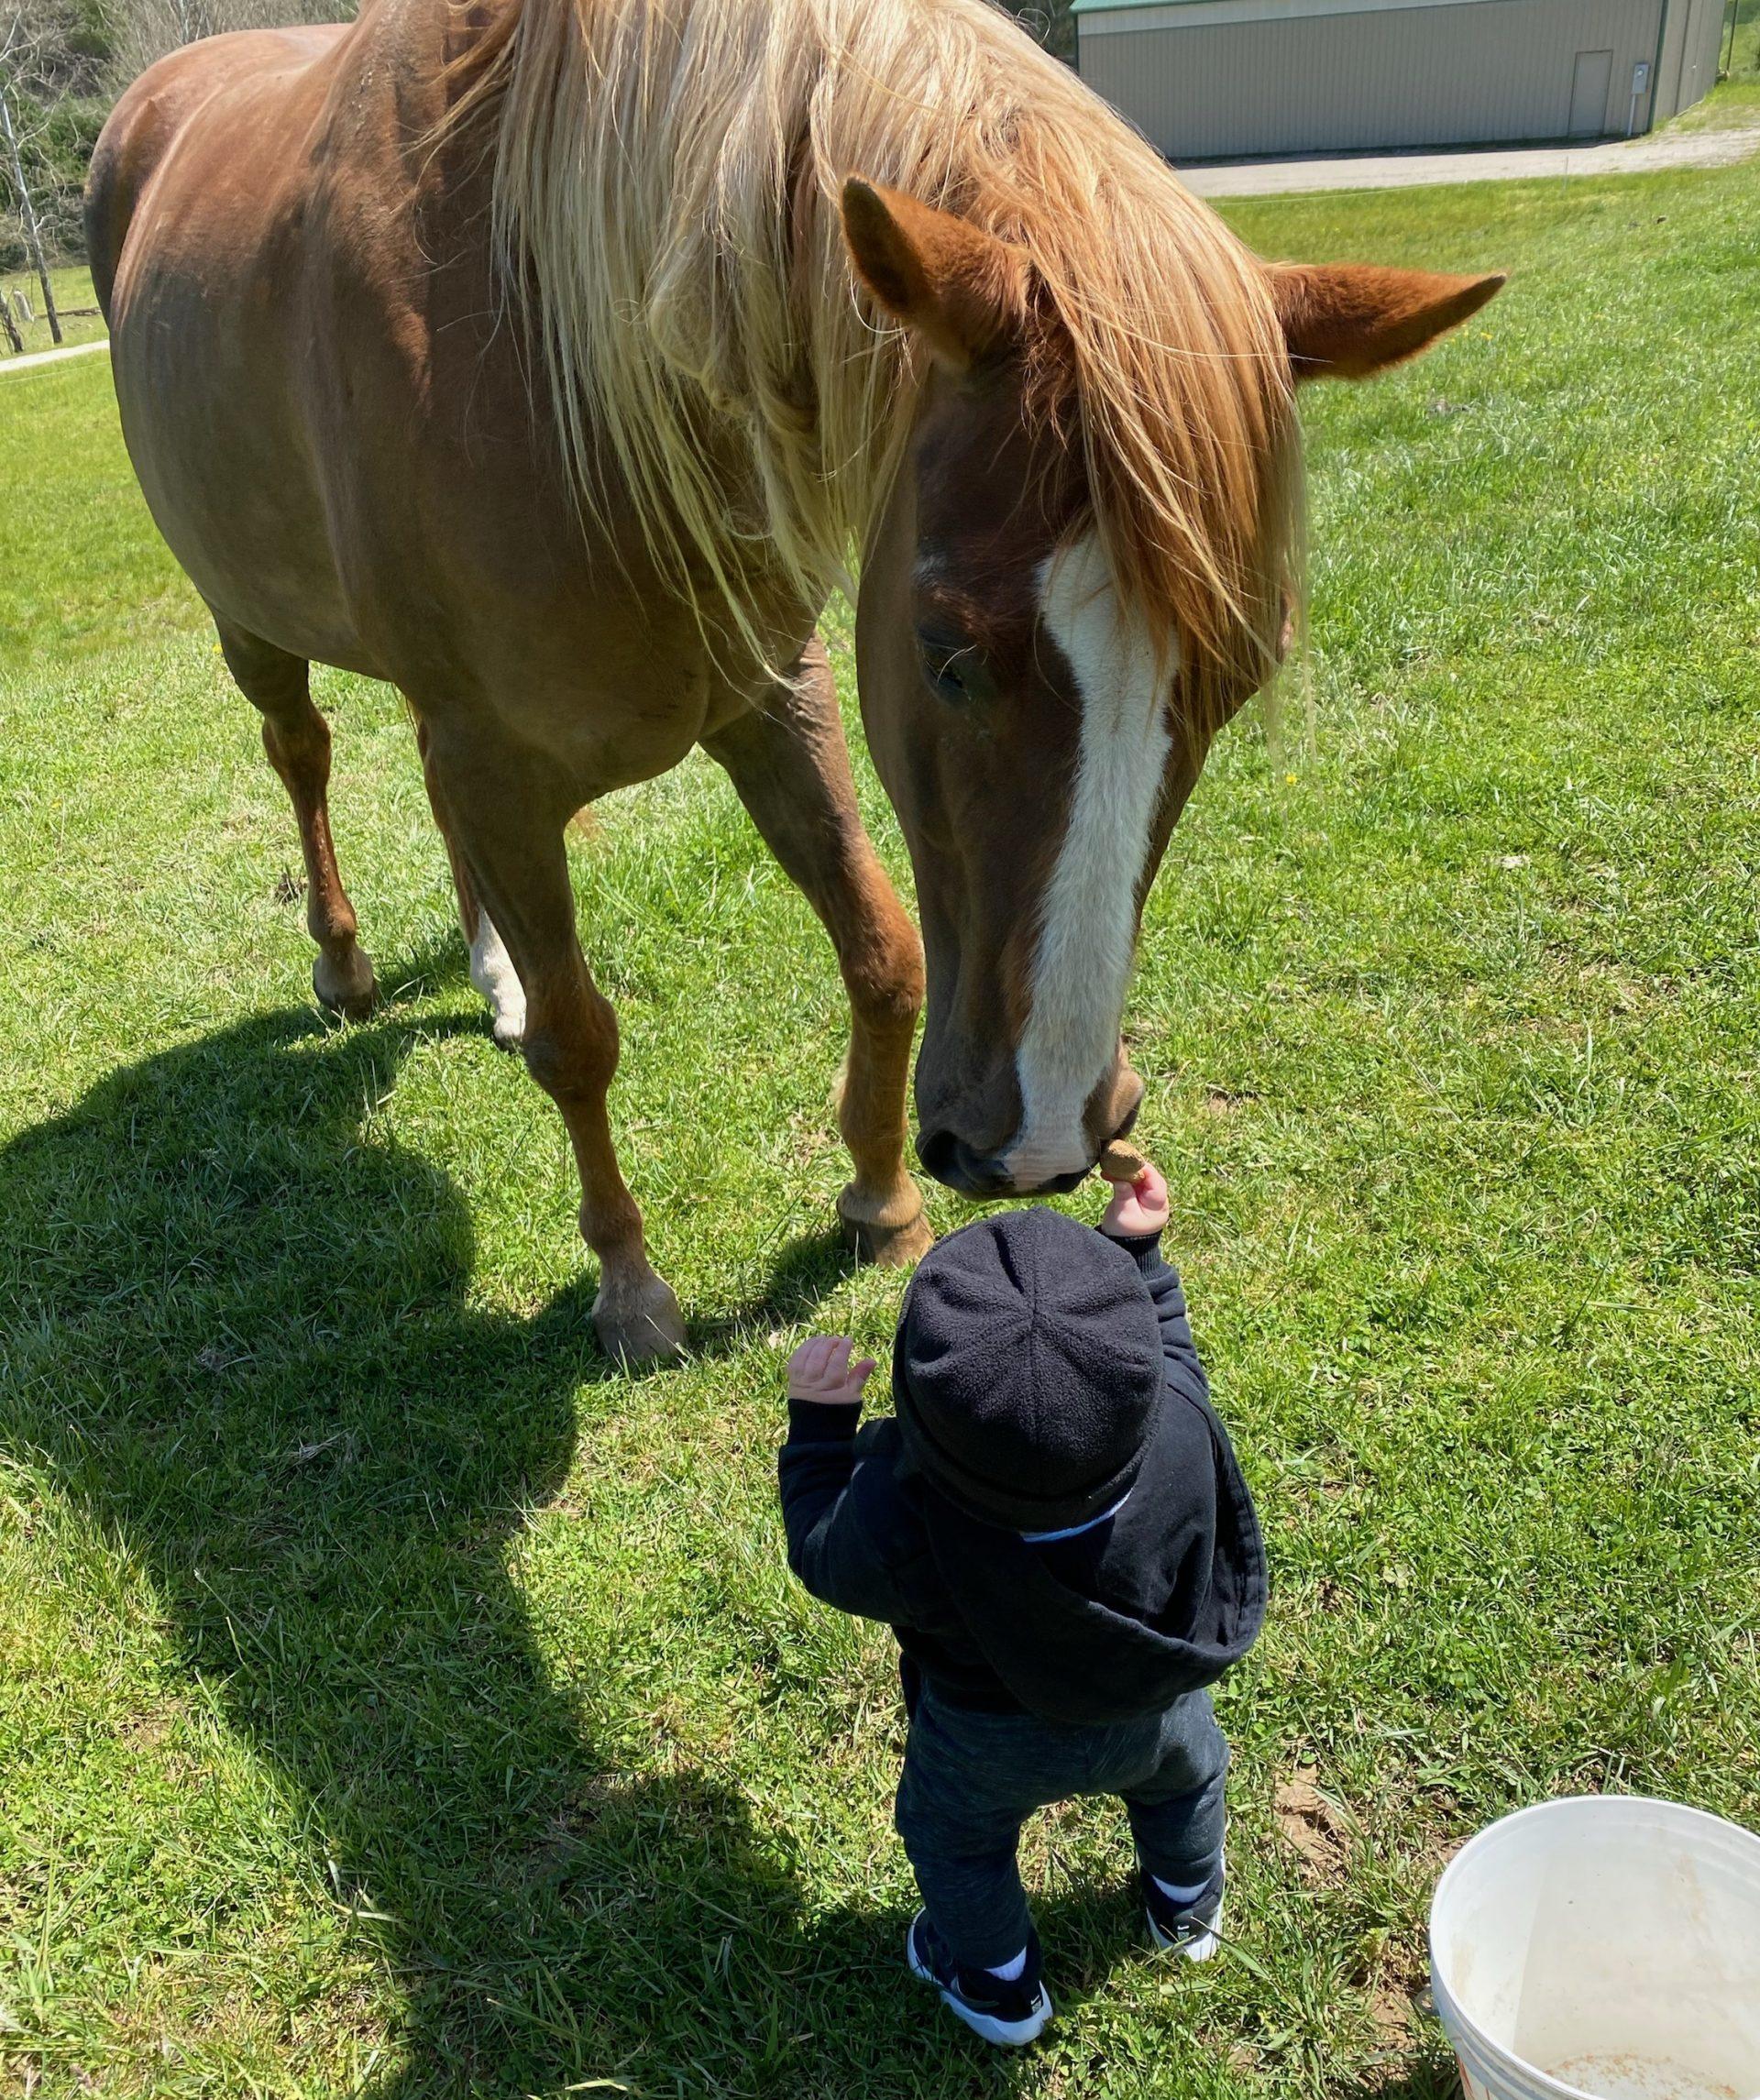 a sweet horse friend